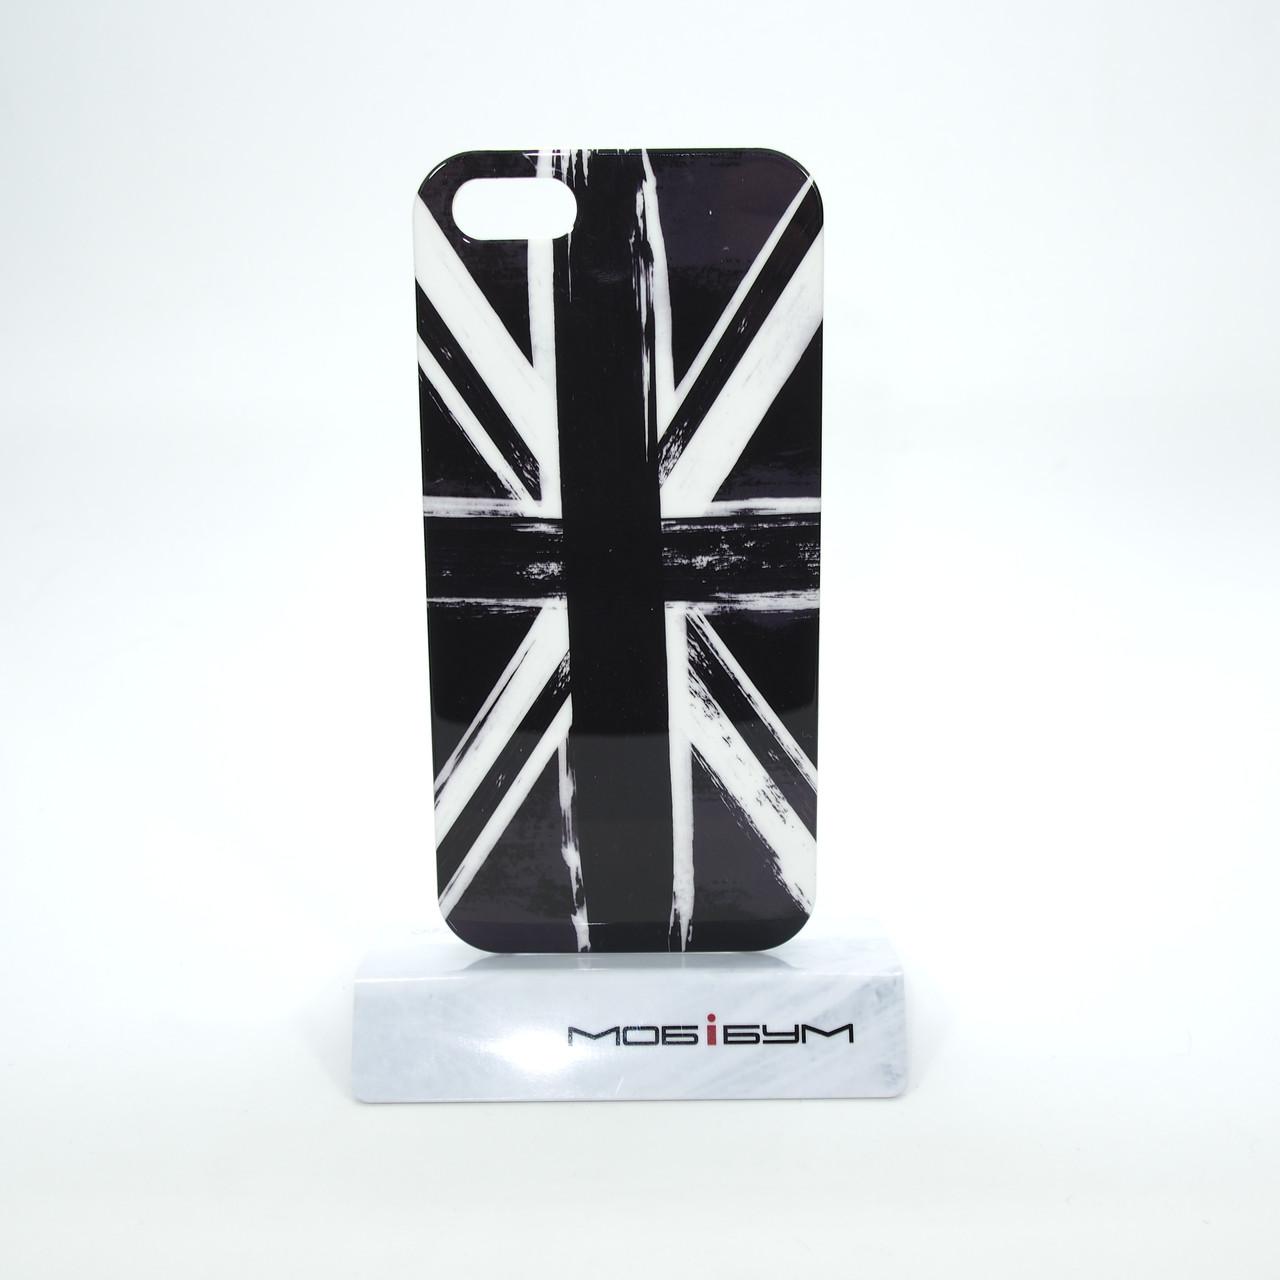 Чехол TnB Slim Clipon Cover iPhone 5s/SE black + scre EAN/UPC: 330317006359